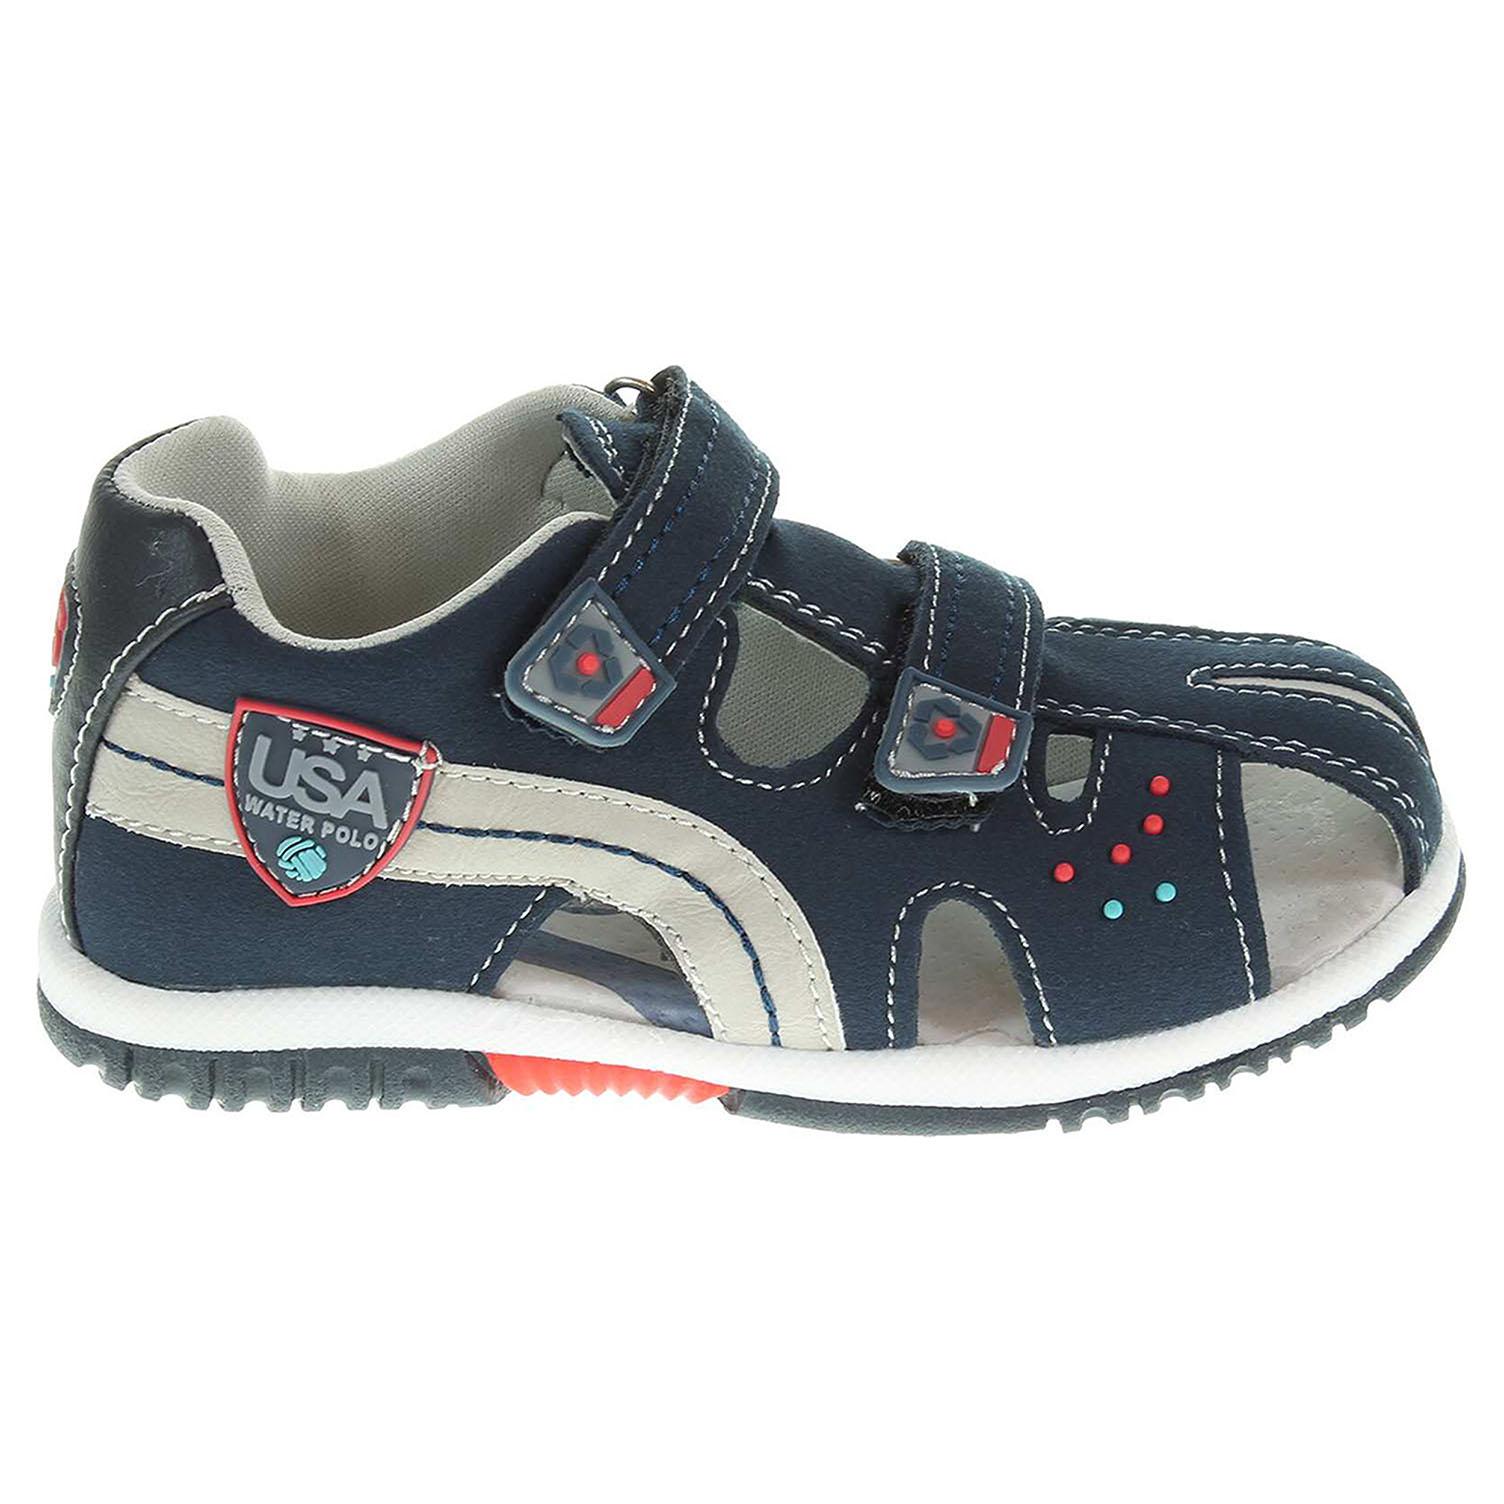 Ecco Chlapecké sandály 105023 modré 29300060